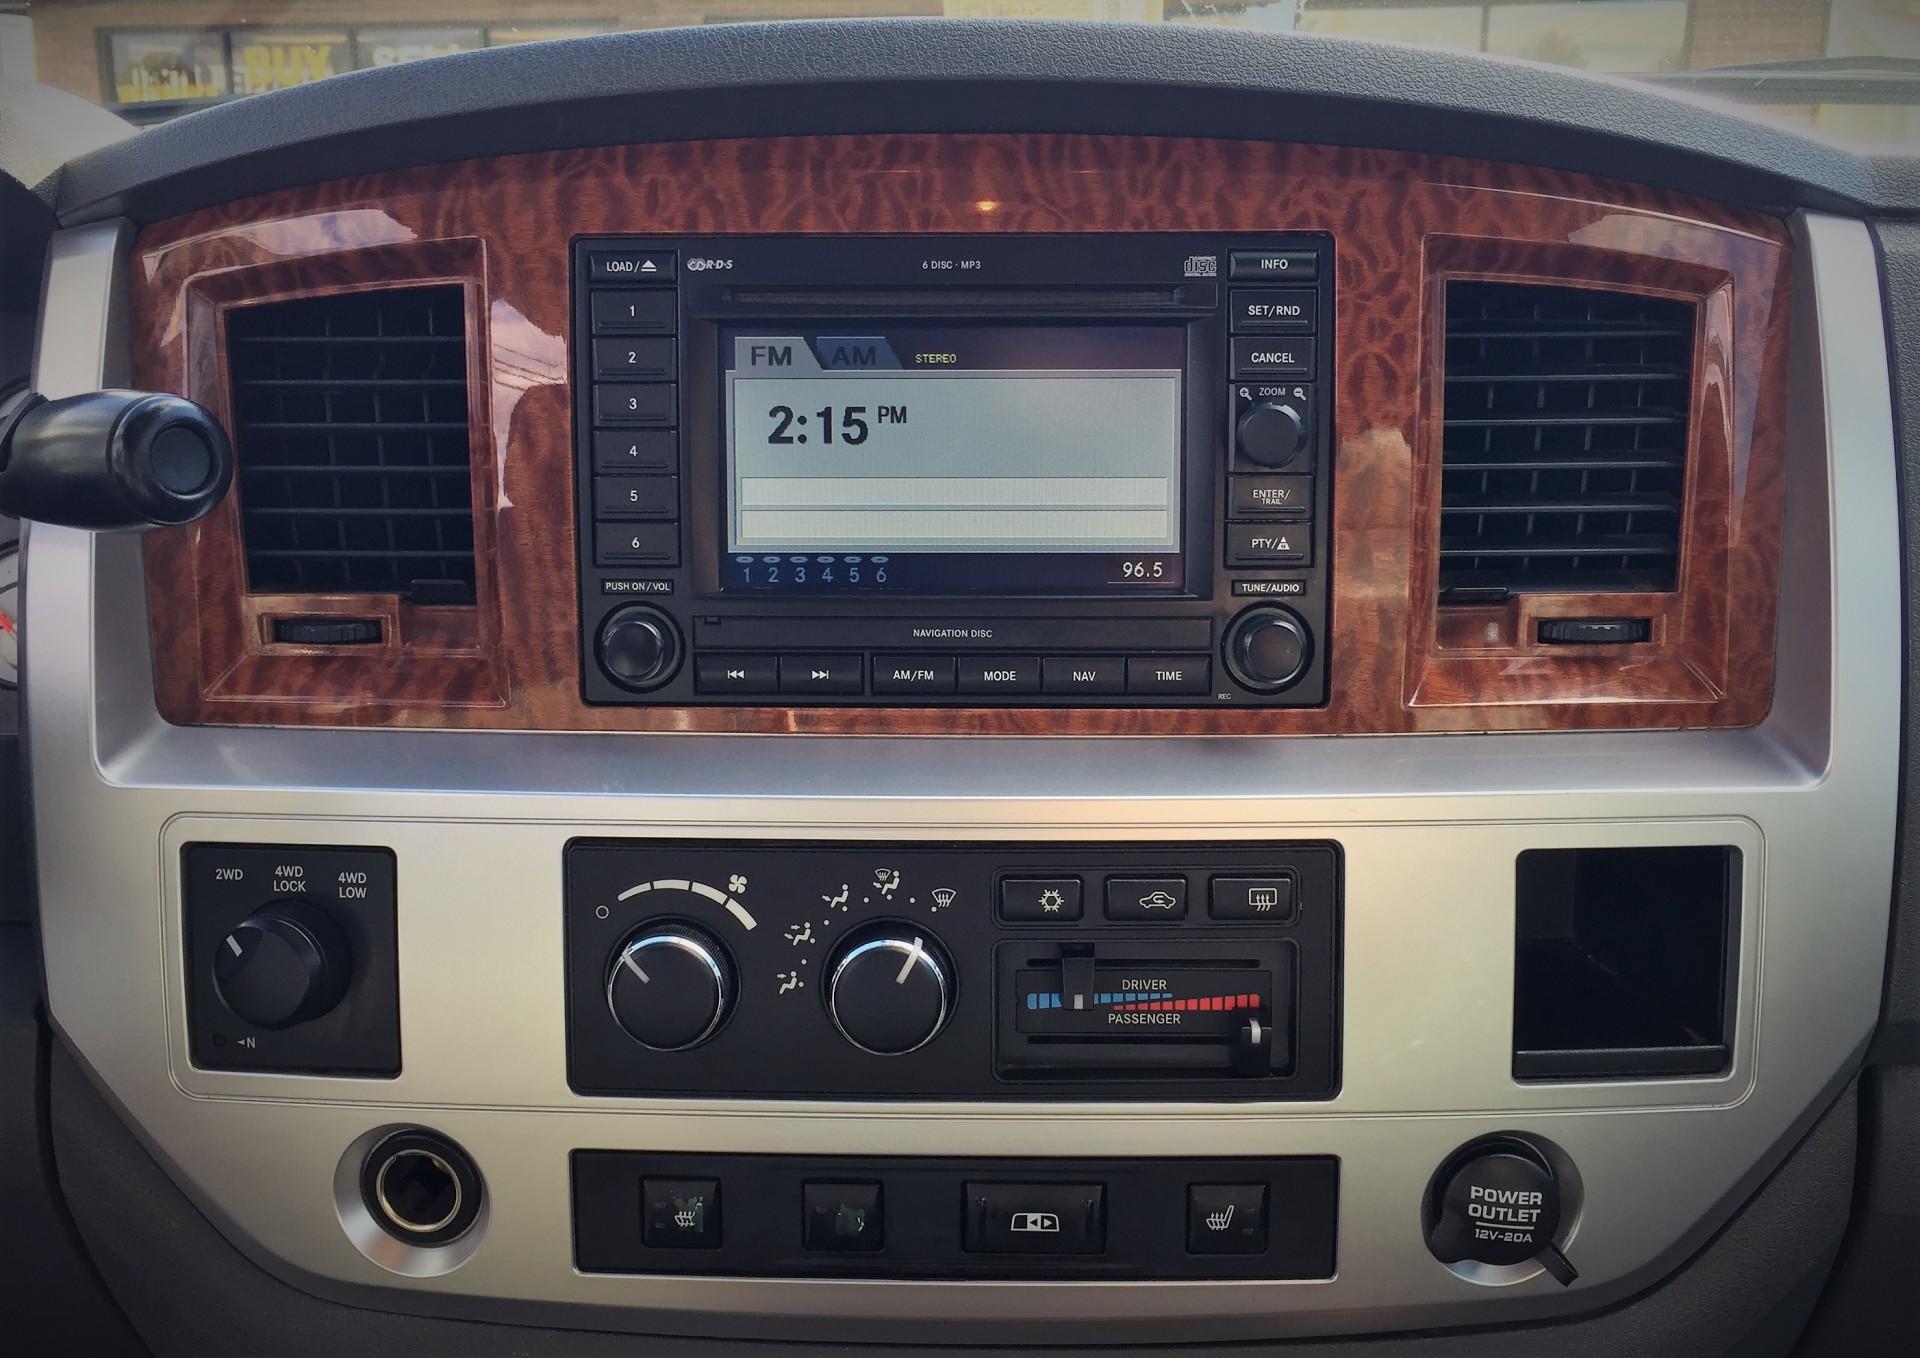 2007 Dodge Ram 3500 Interior